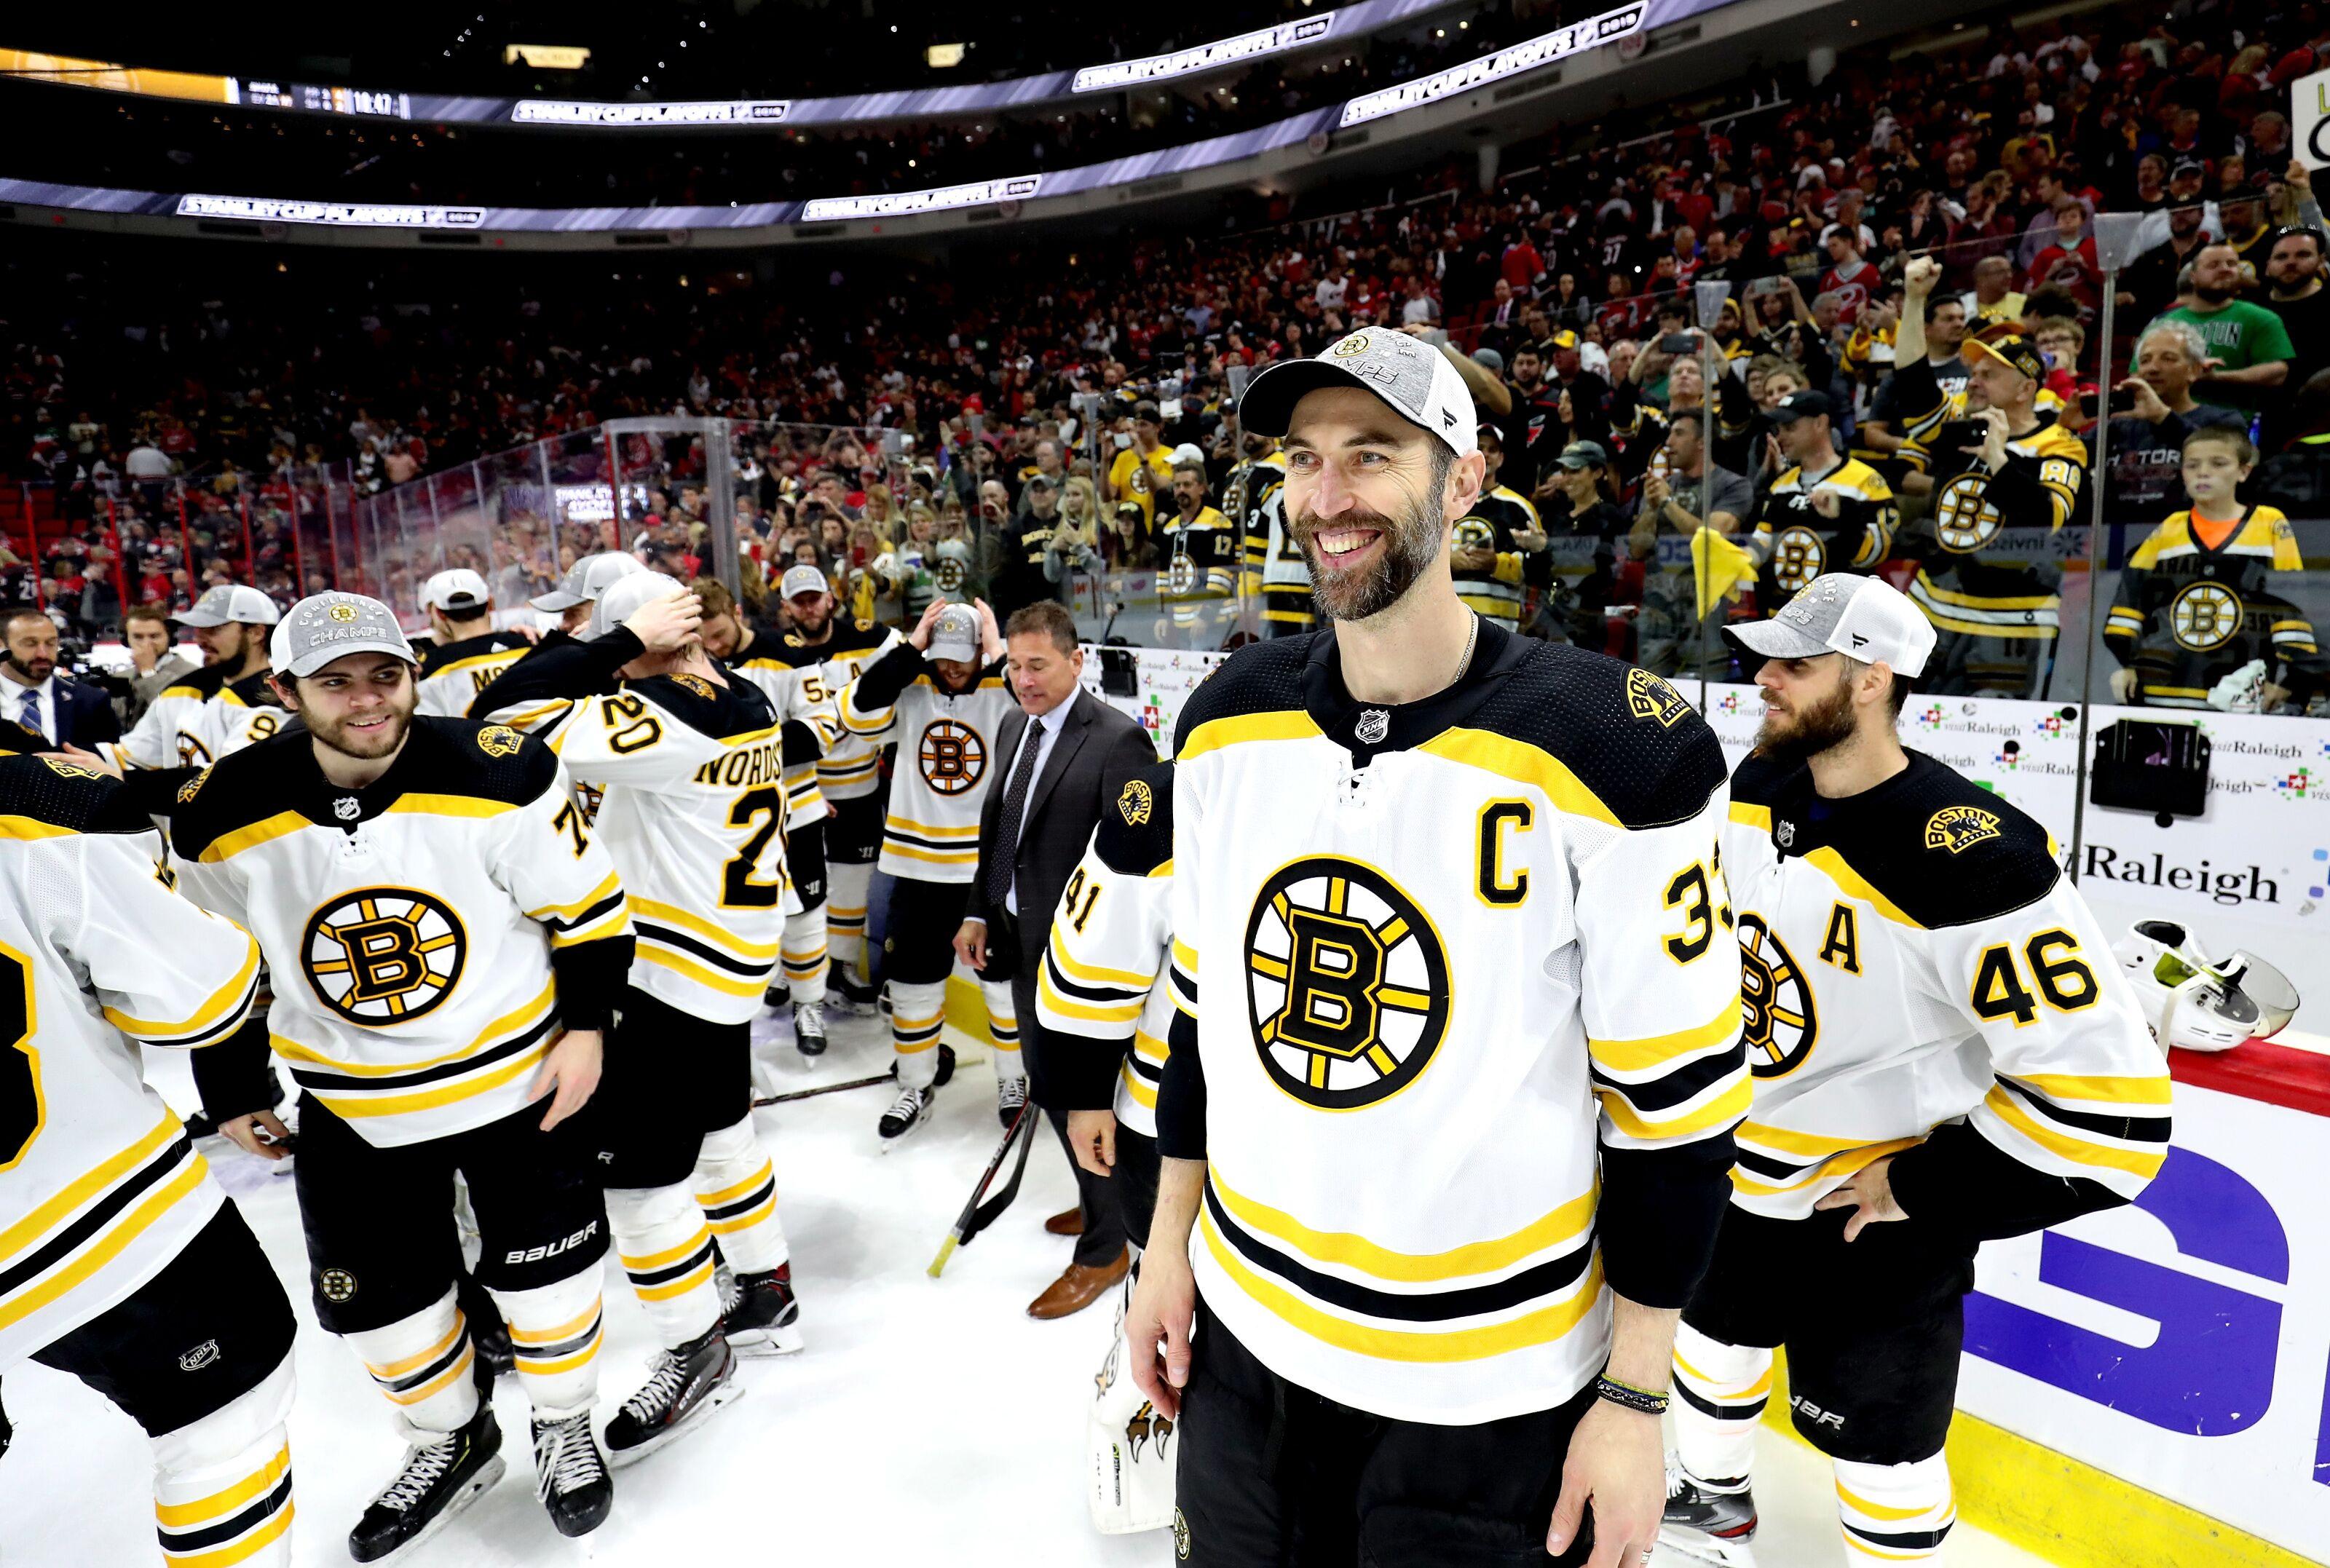 Boston Bruins: Even without Zdeno Chara the defense shone ...